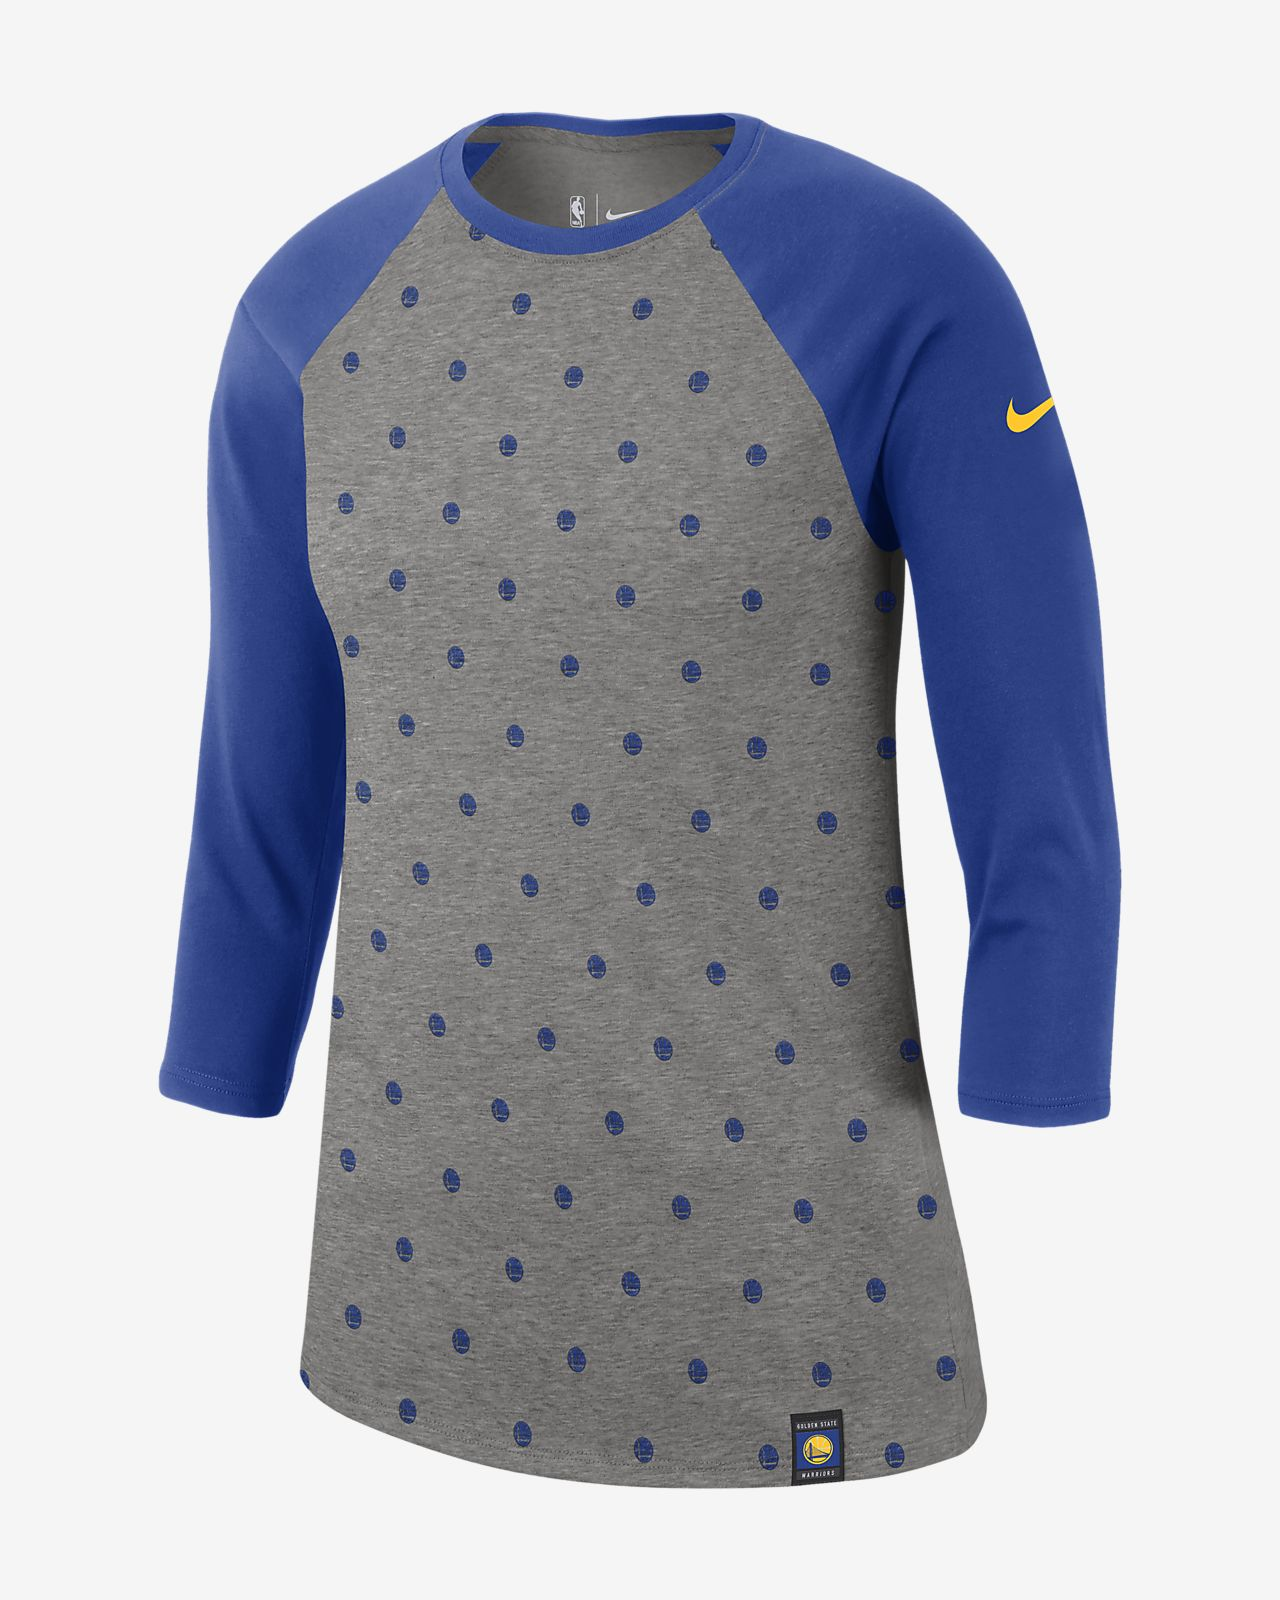 6e44dfcb7 Golden State Warriors Nike Dri-FIT Women's 3/4-Sleeve NBA T-Shirt ...